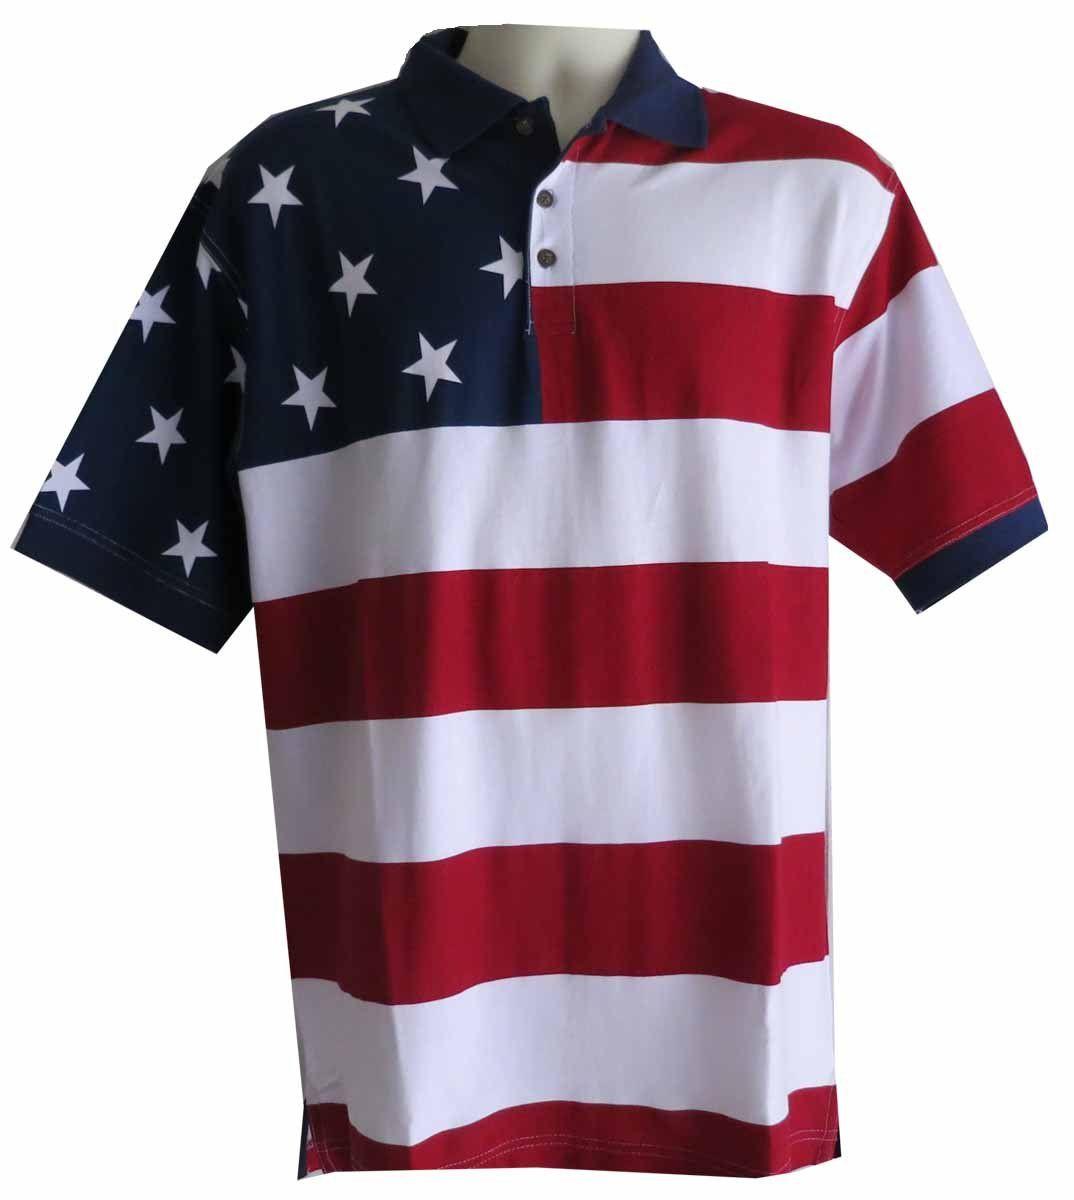 Stars Stripes Patriotic American Flag Polo Shirt For Men